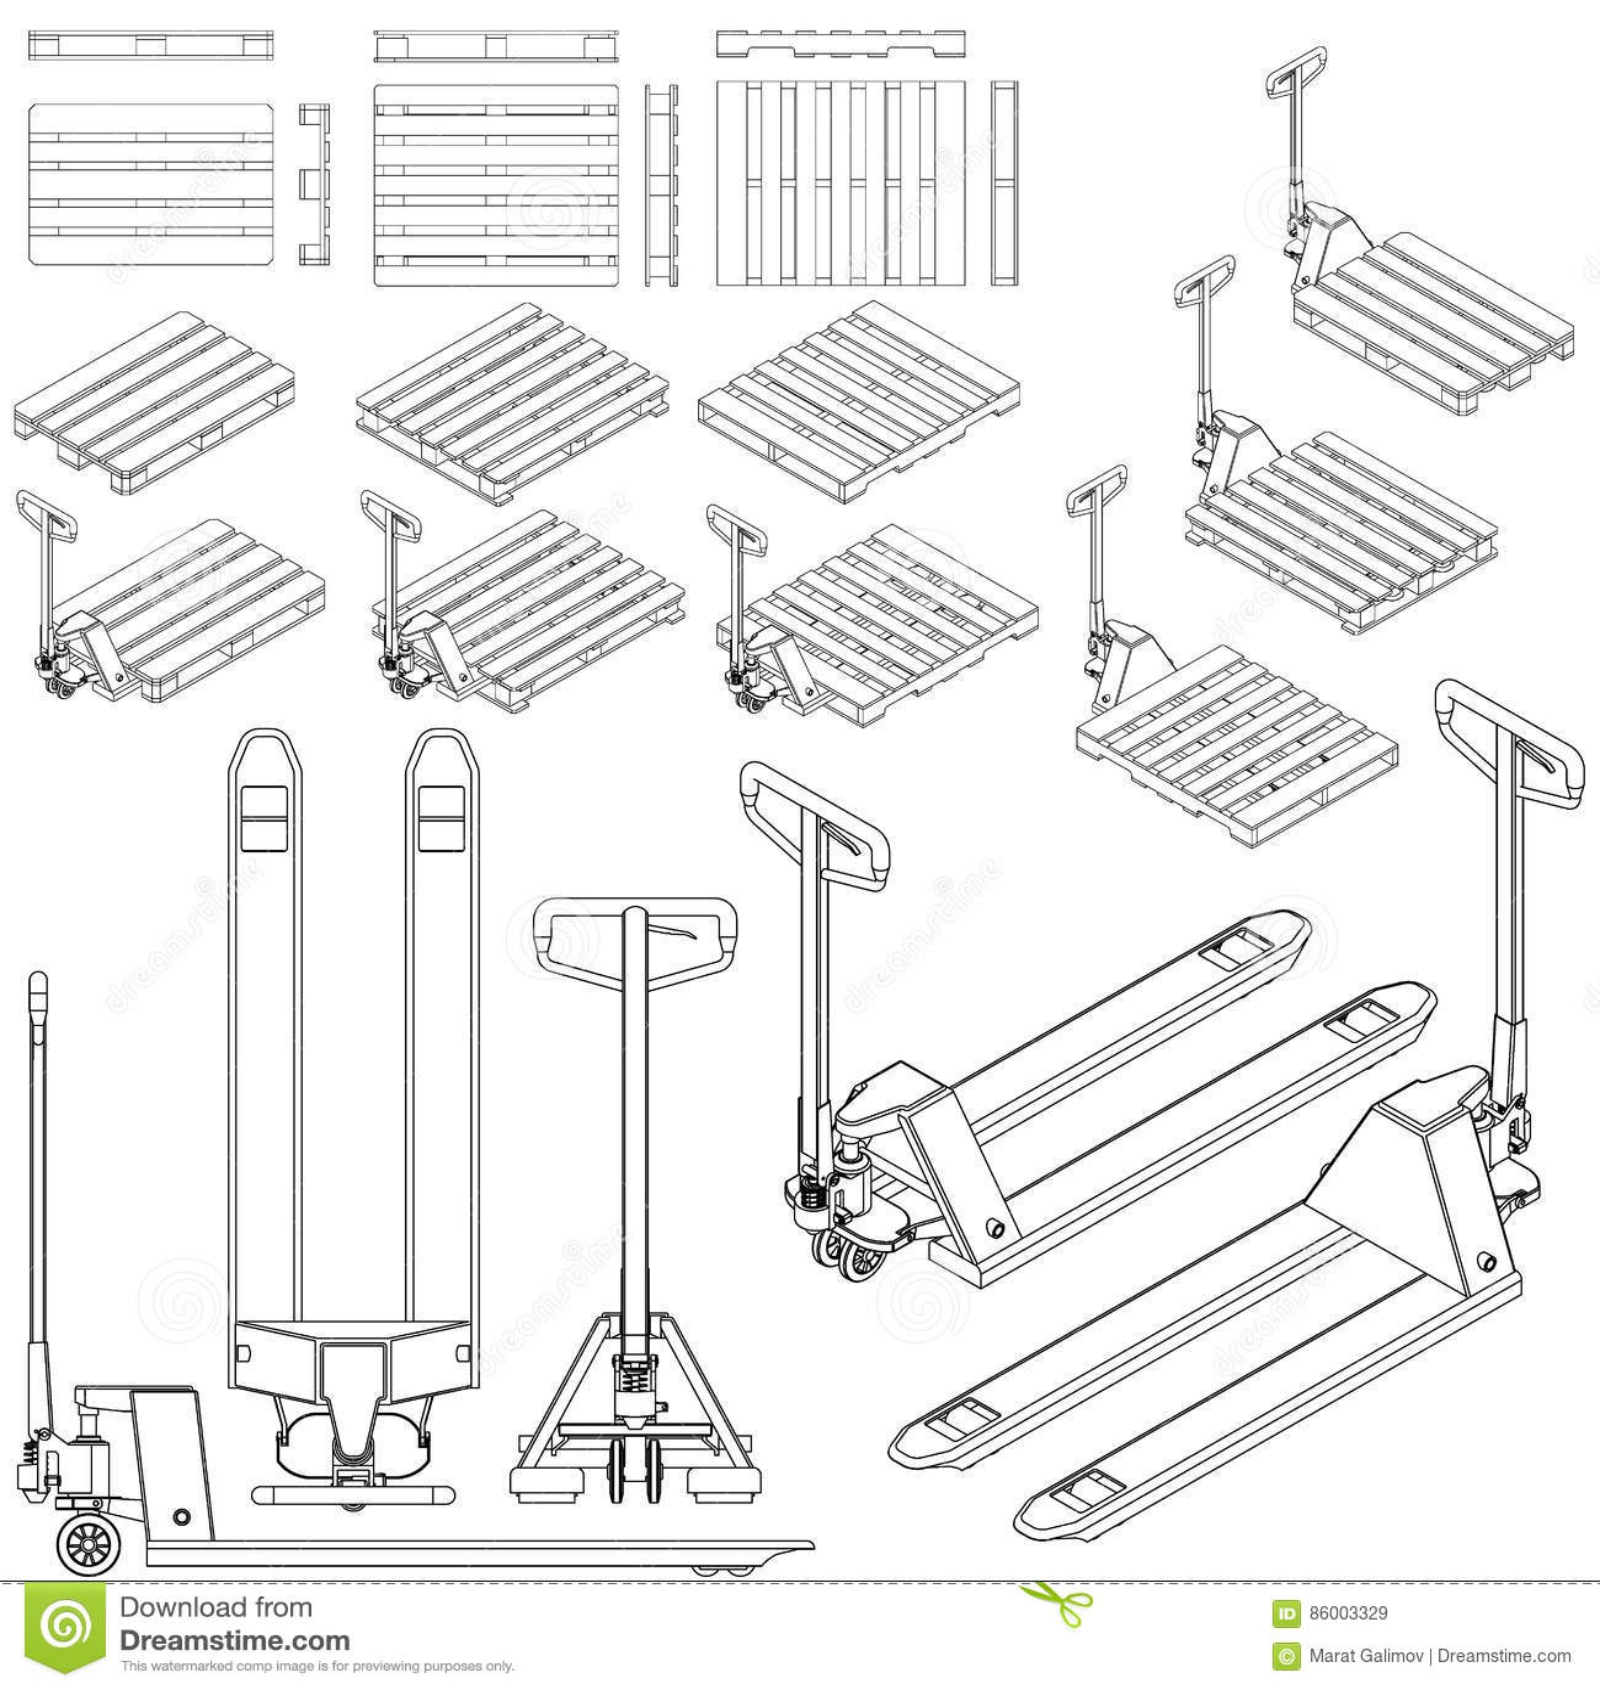 trolley cartoon clipart